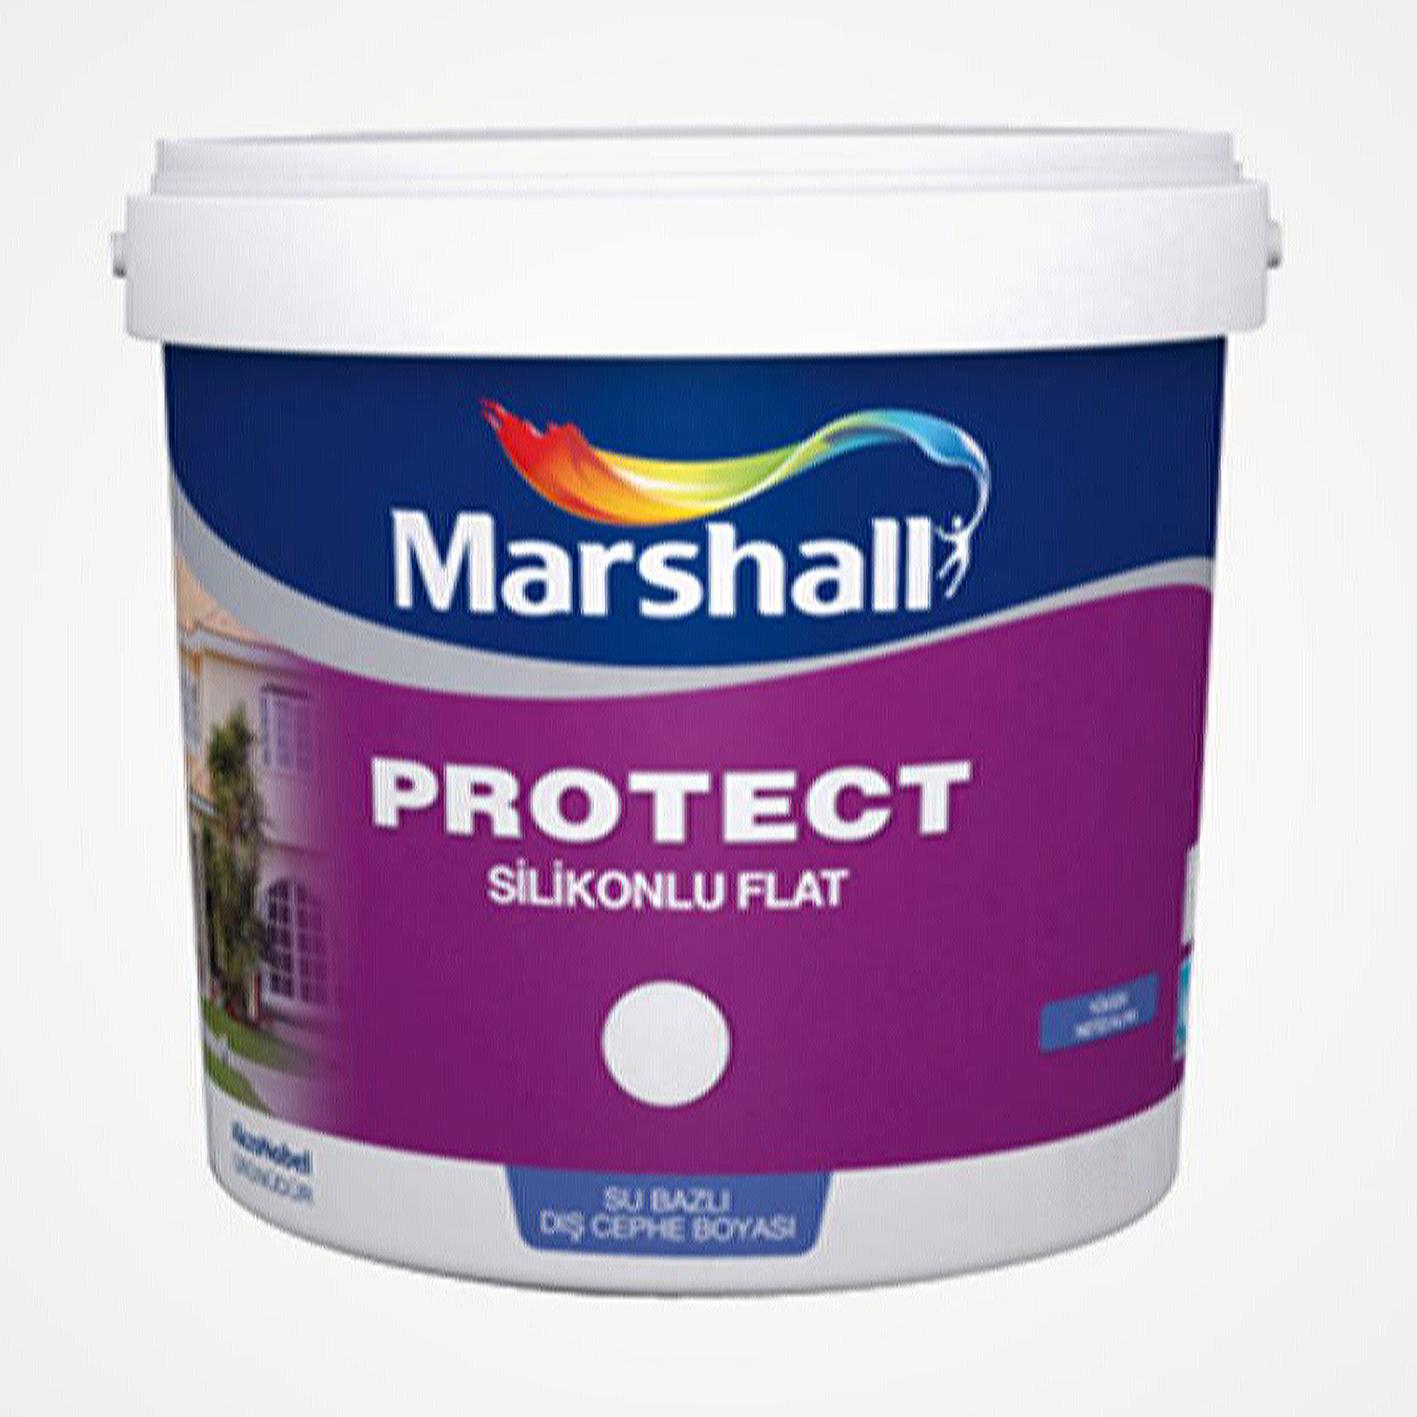 Marshall Protect Silikonlu Dış Cephe Beyaz BW 7.5Lt